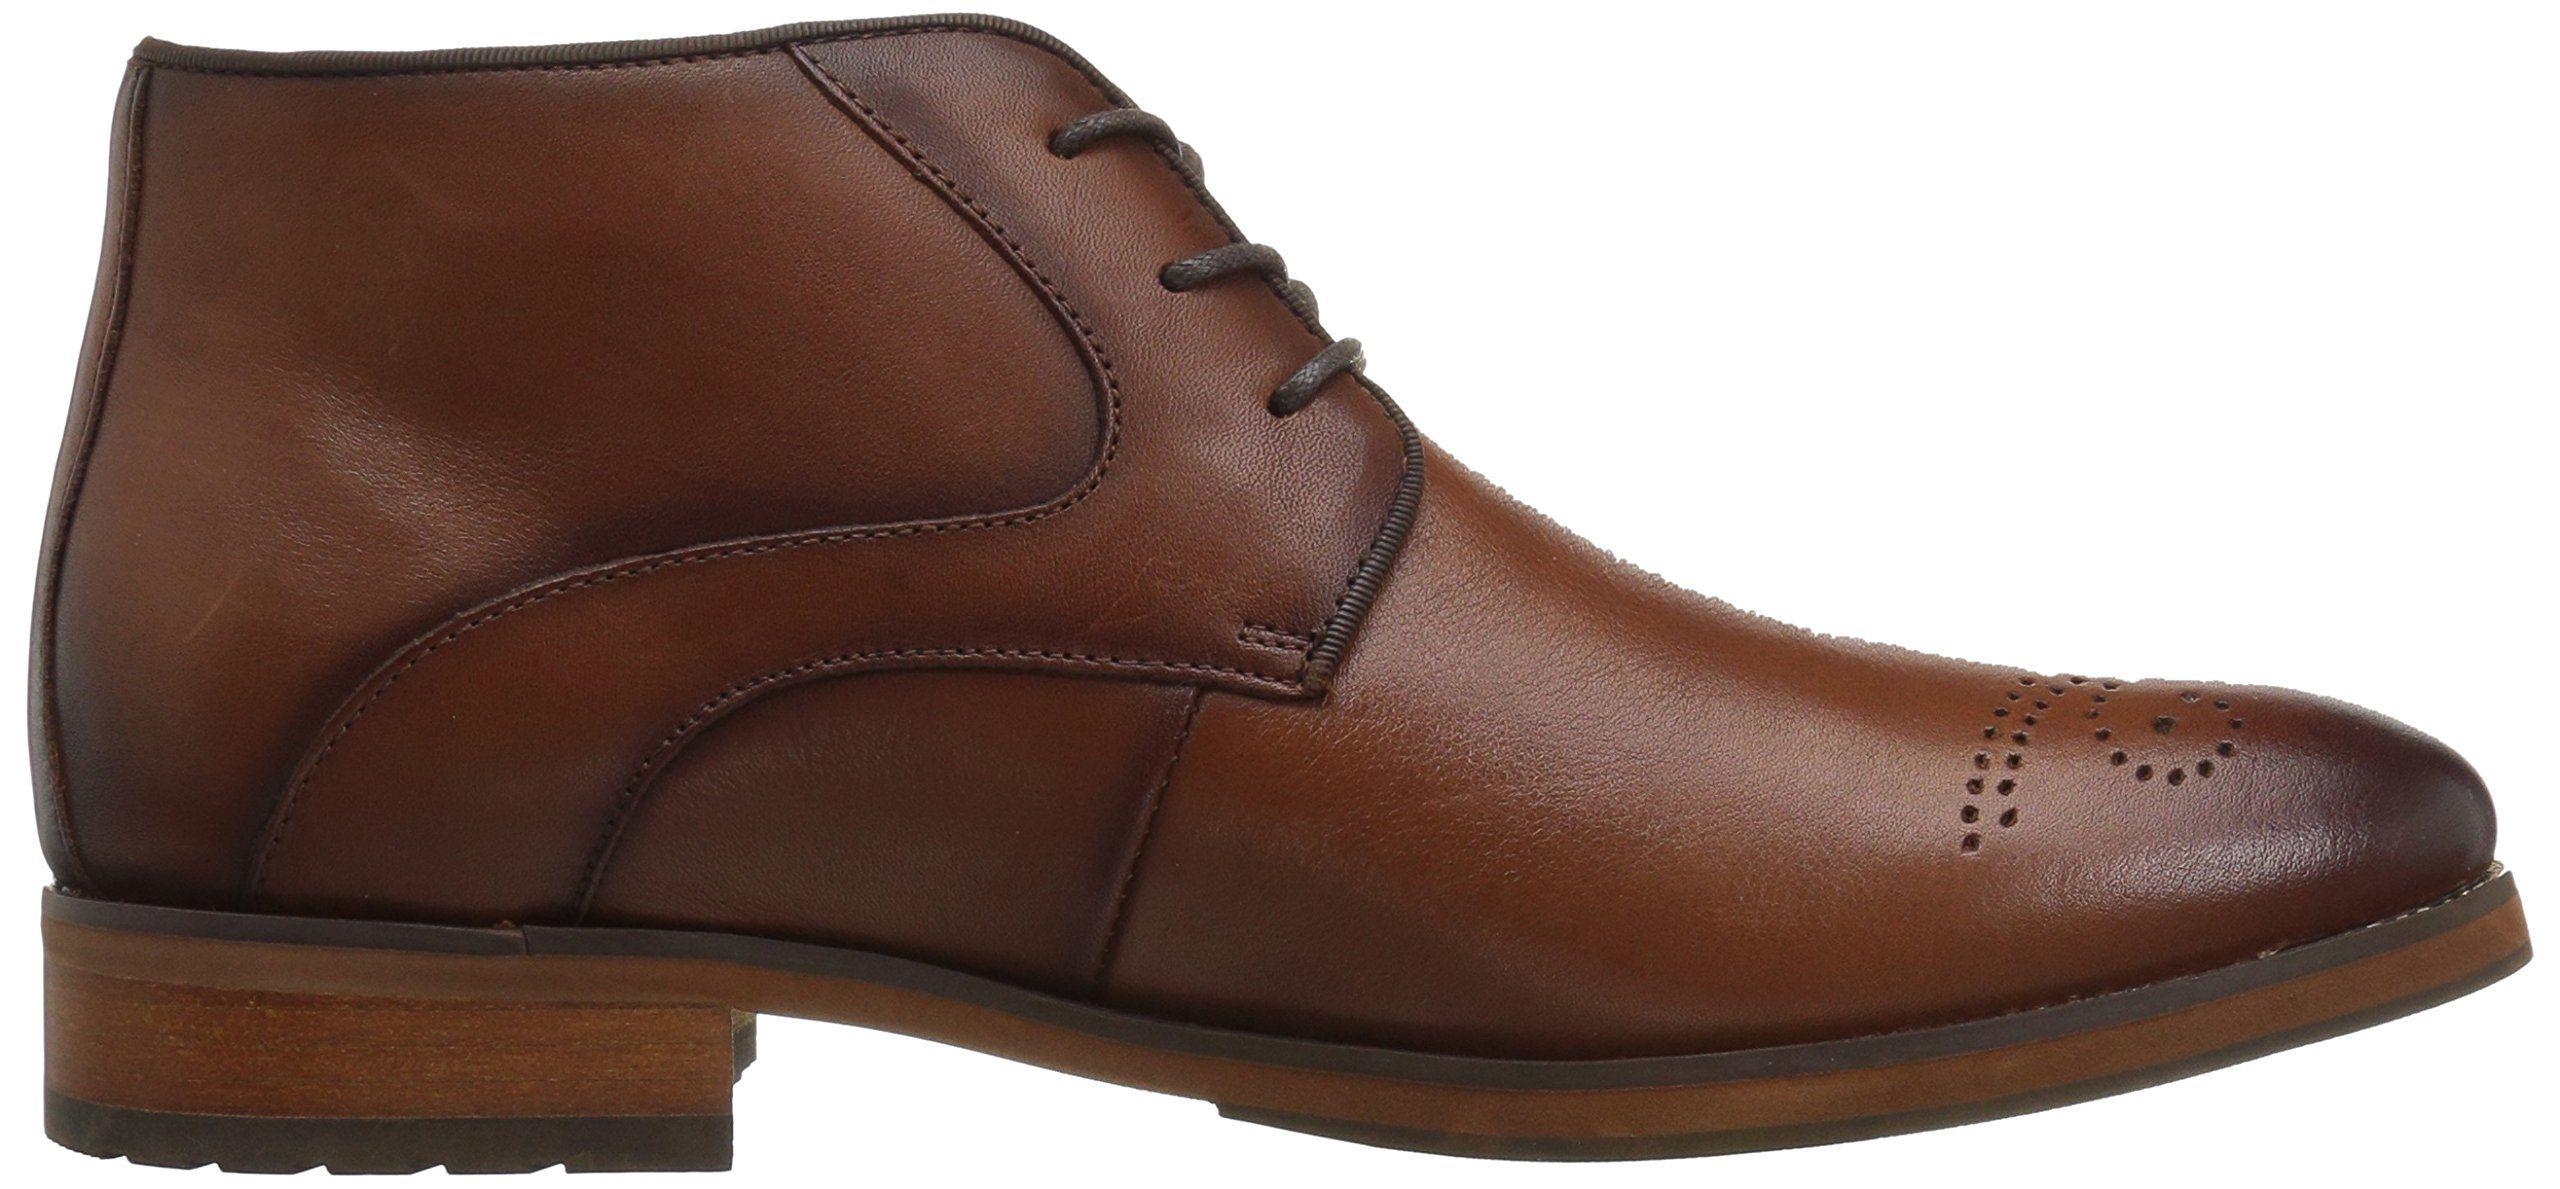 zapatos salomon hombre amazon opiniones tallas asos